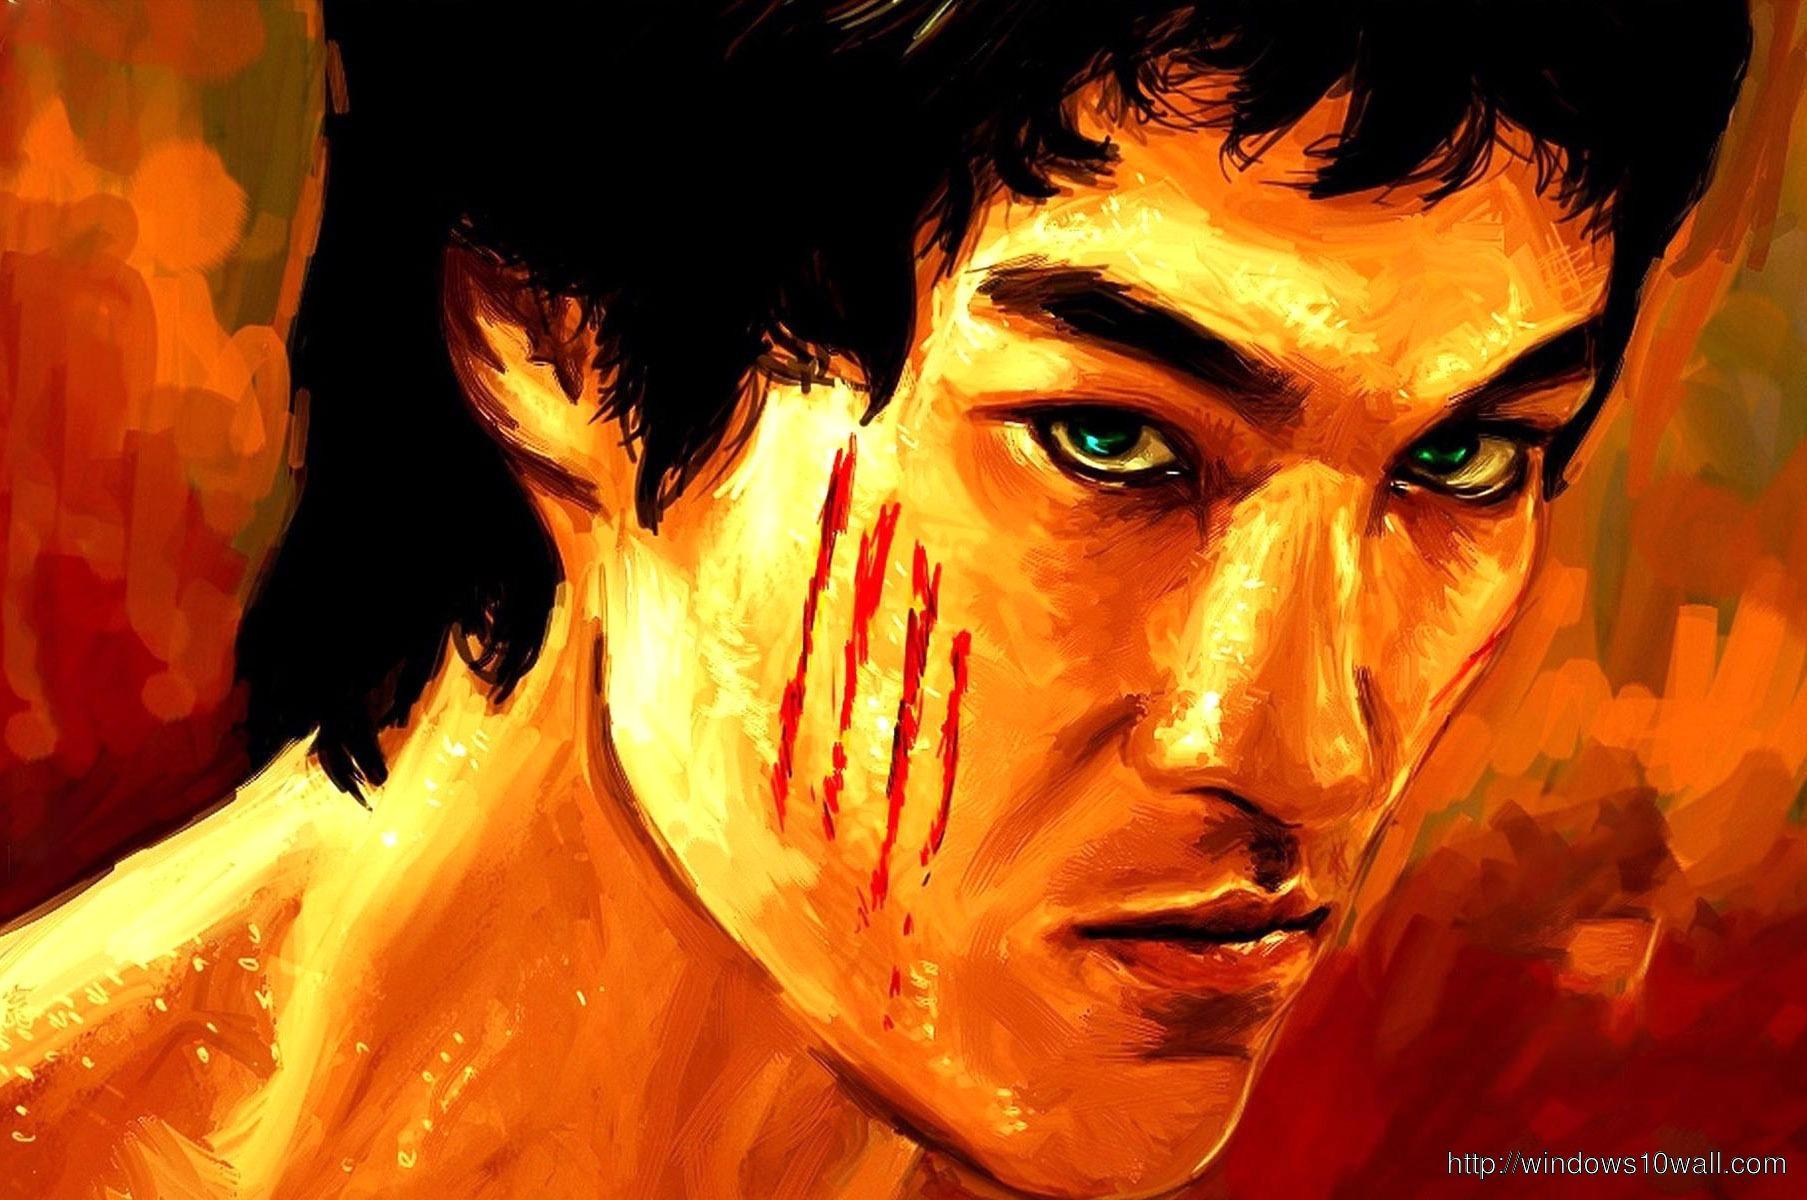 Bruce Lee WideScreen HD Wallpaper - windows 10 Wallpapers